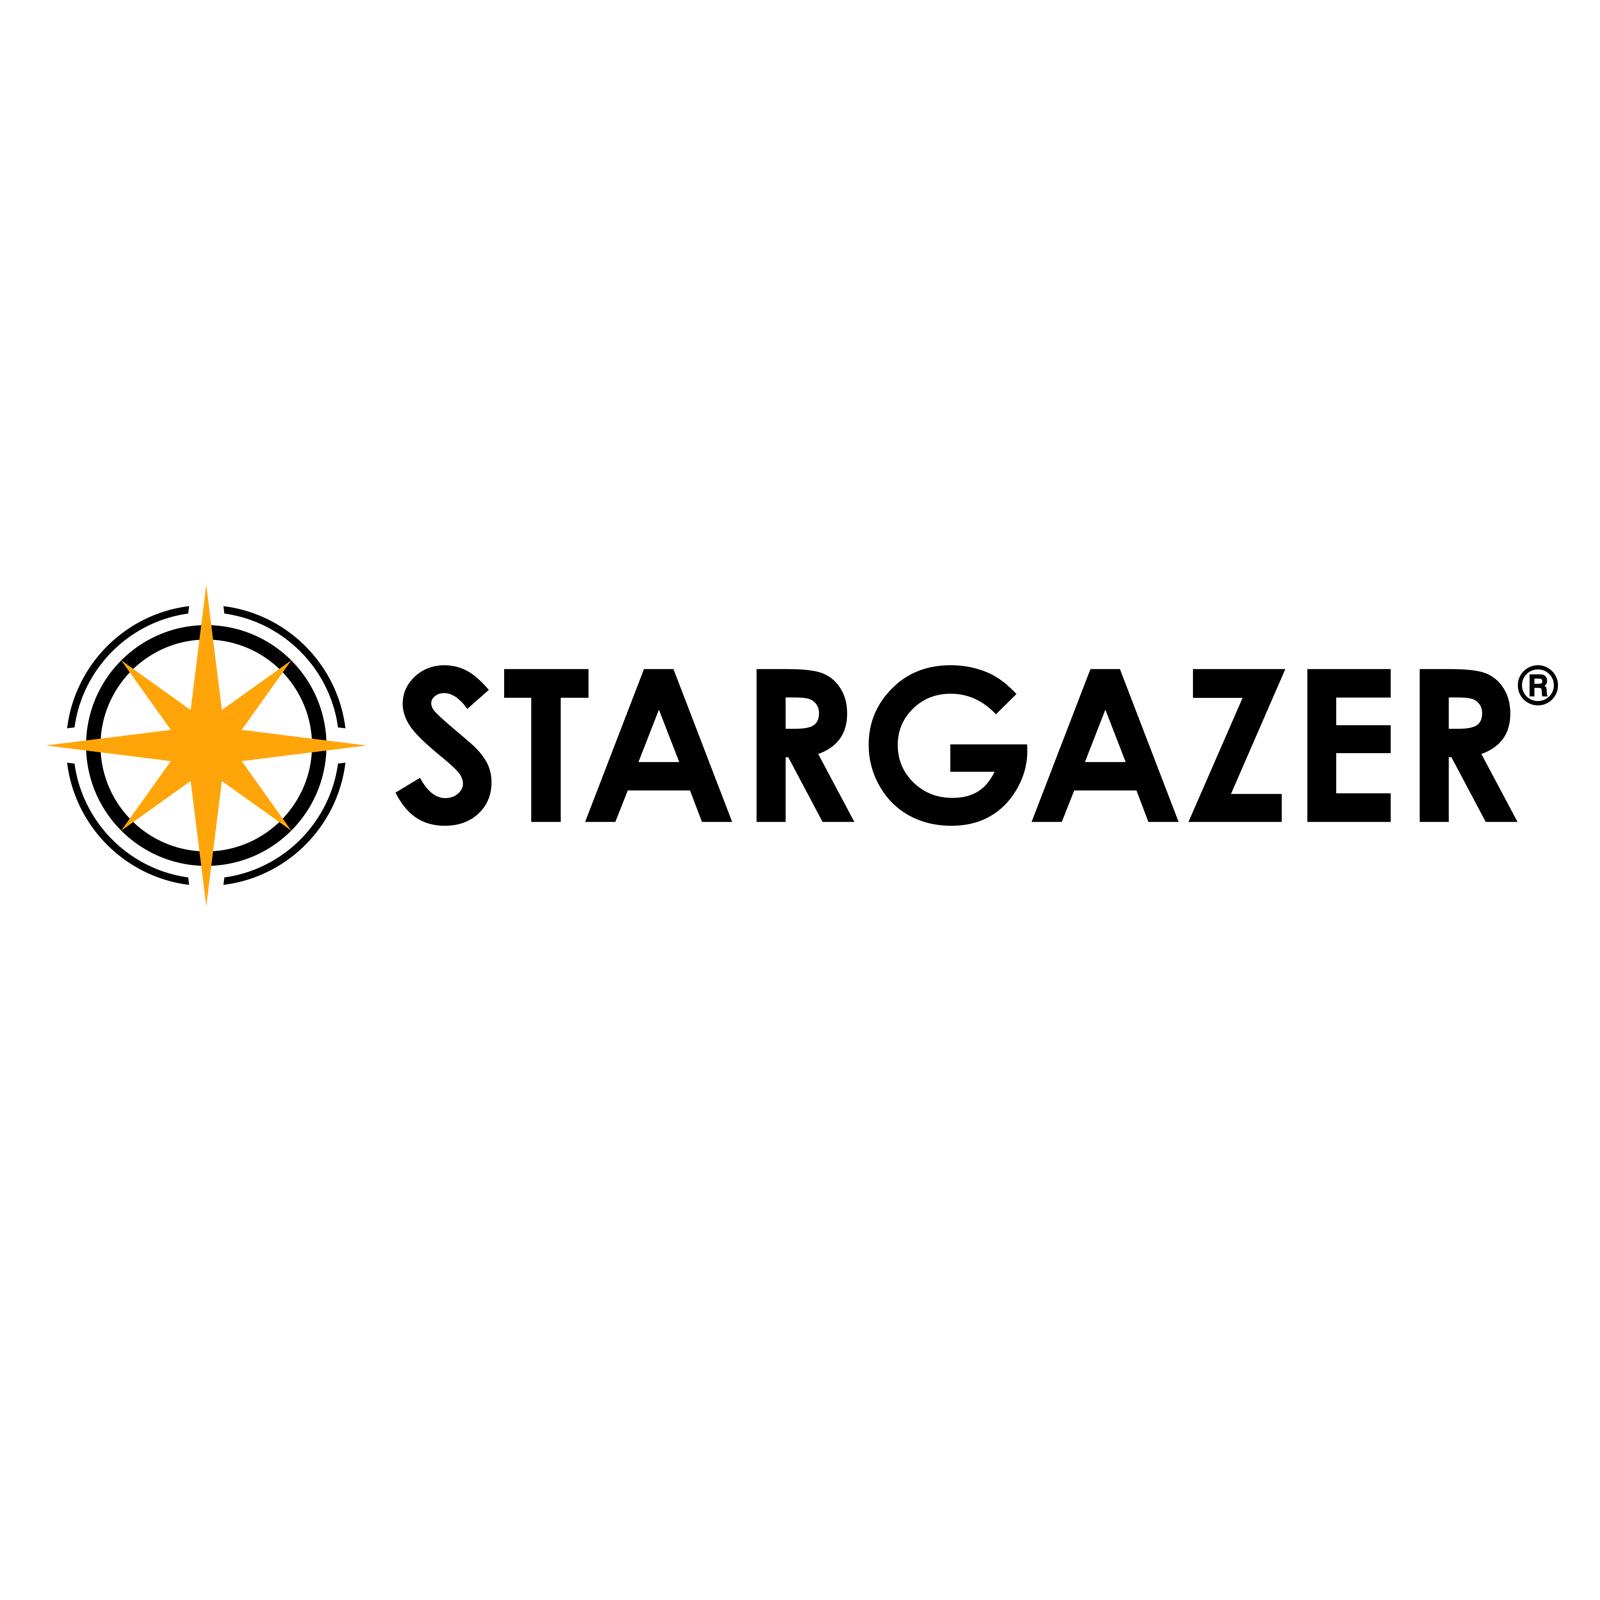 Stargazer Square.jpg